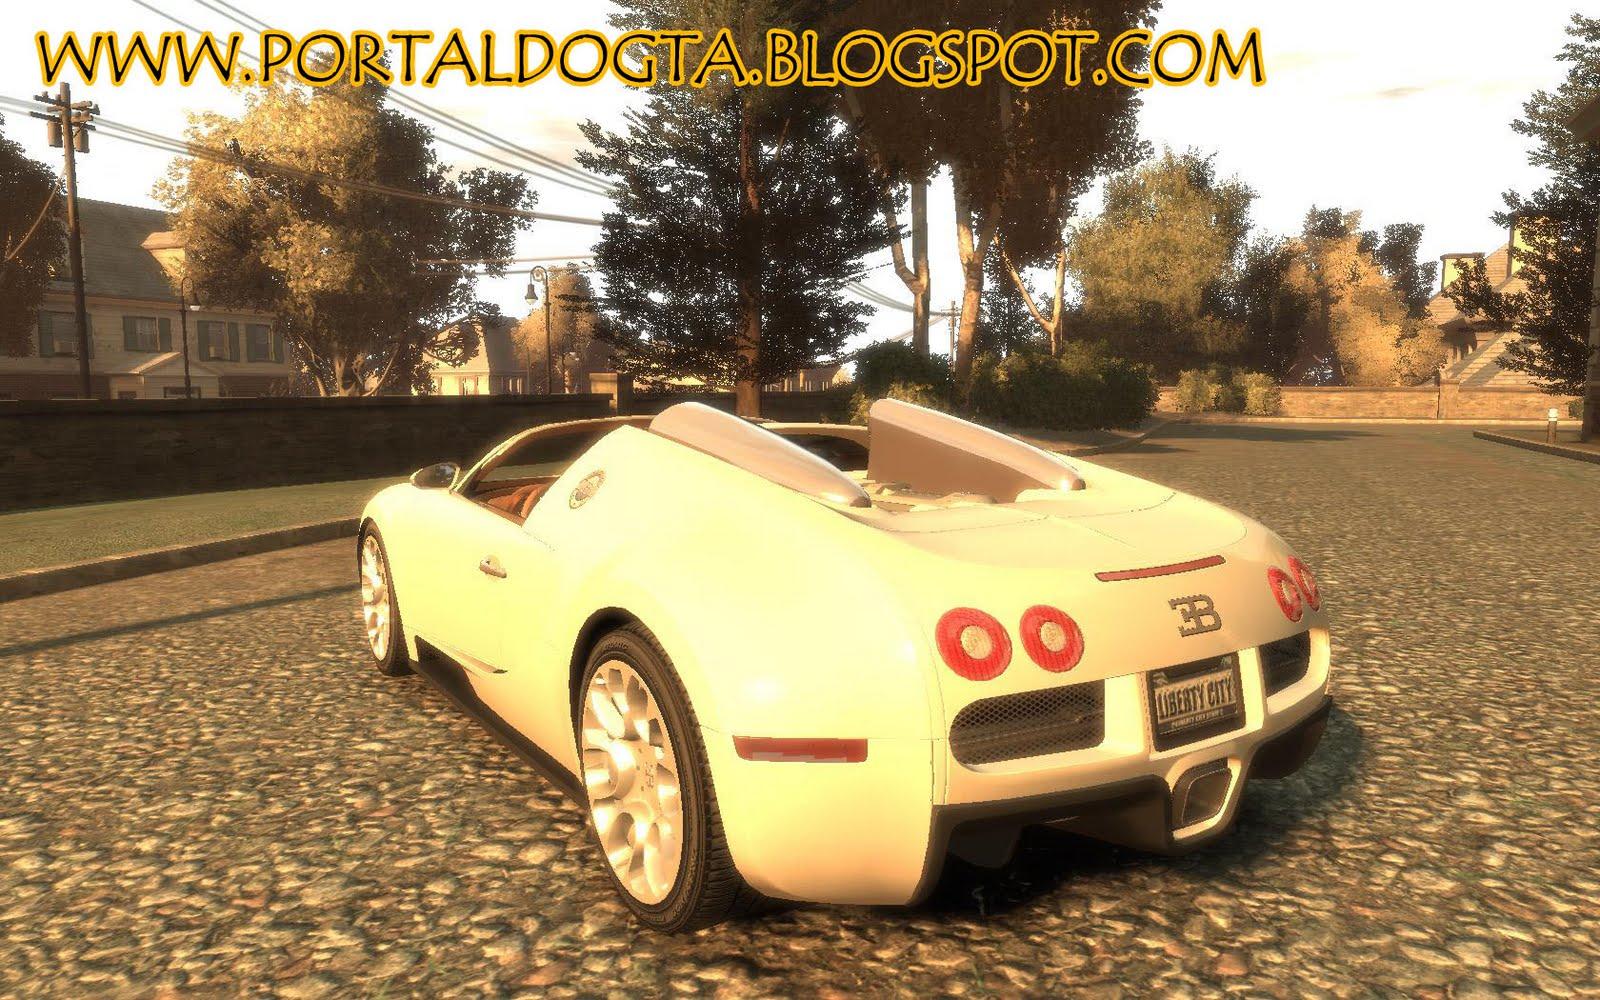 iv bugatti veyron grand sport epm 2009 portal do gta. Black Bedroom Furniture Sets. Home Design Ideas